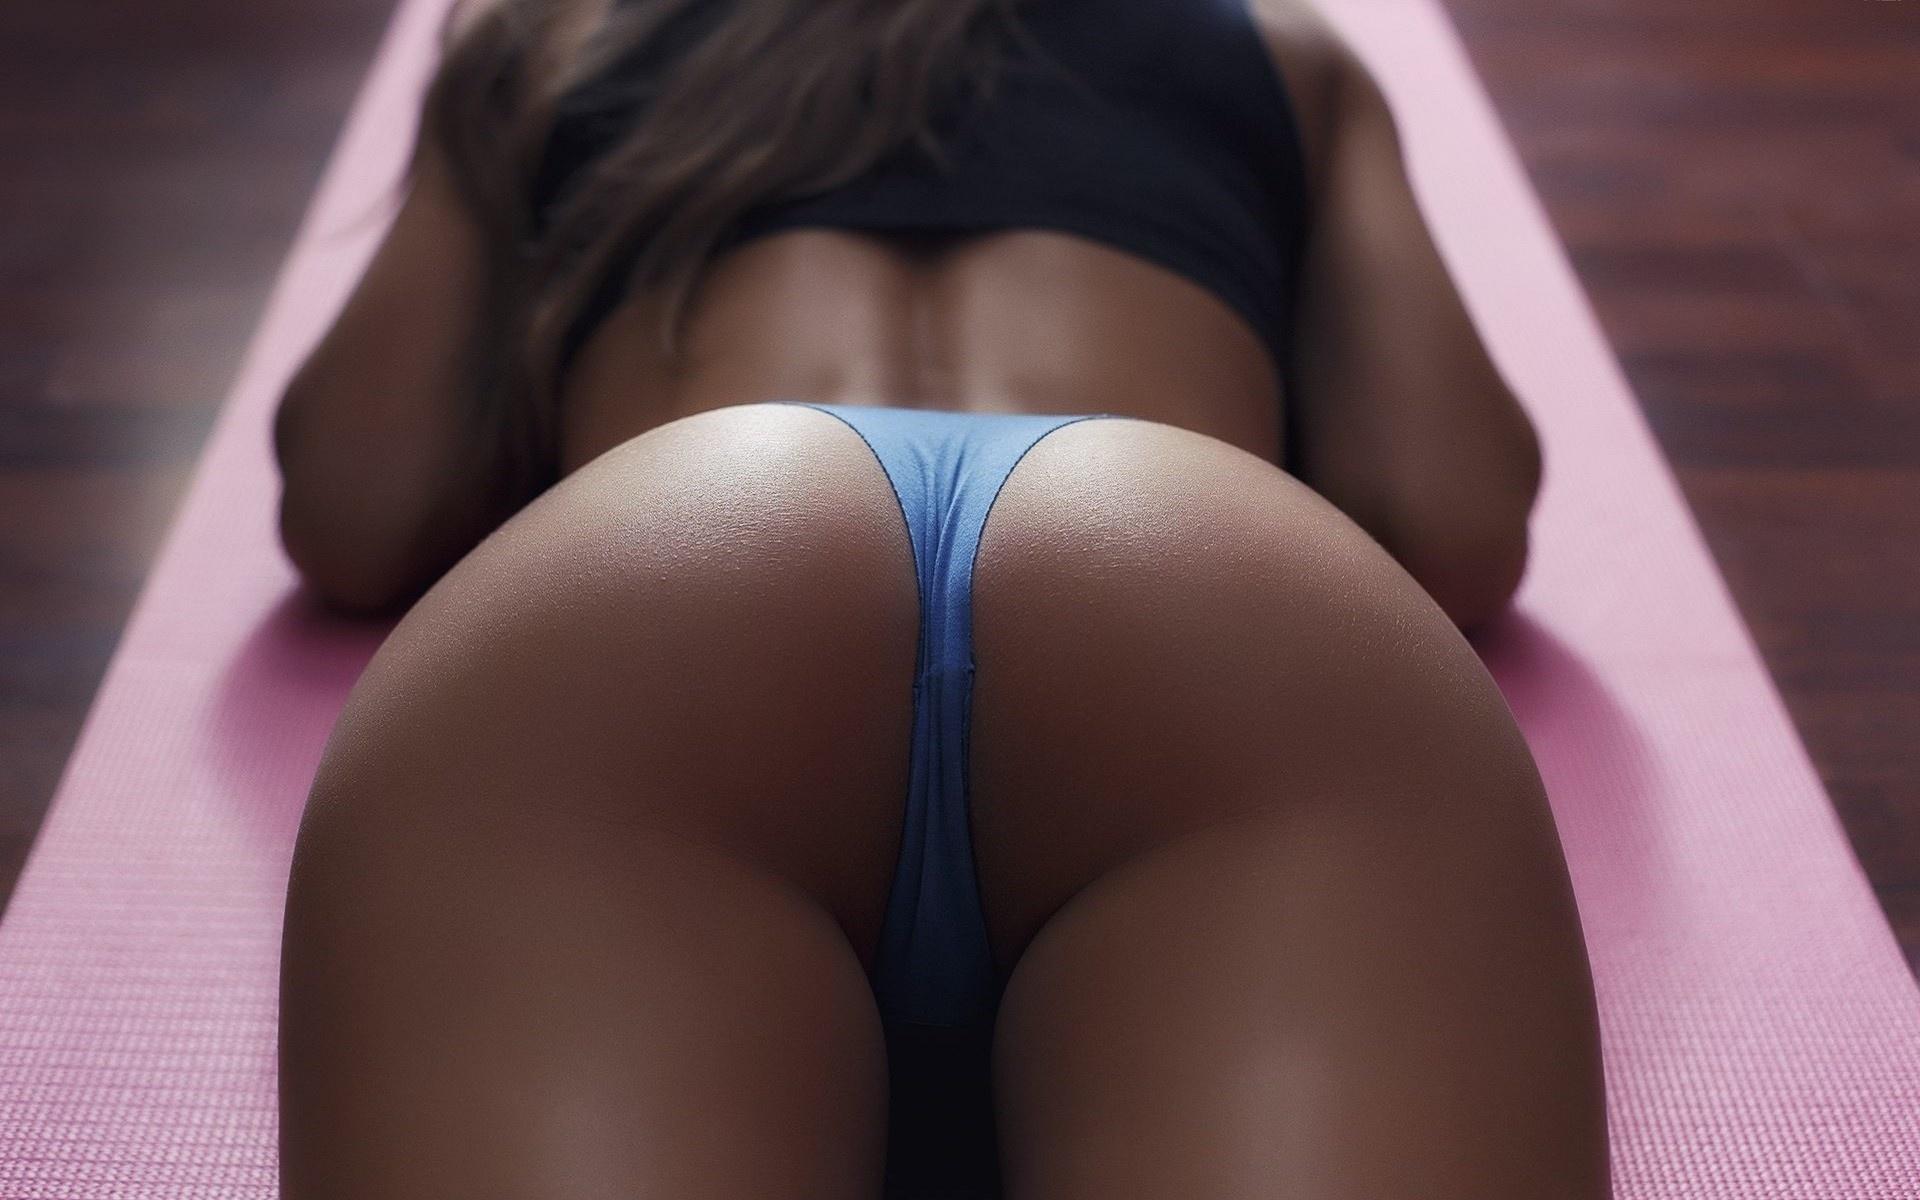 super-puper-popki-foto-porno-foto-devku-ebut-v-pizdu